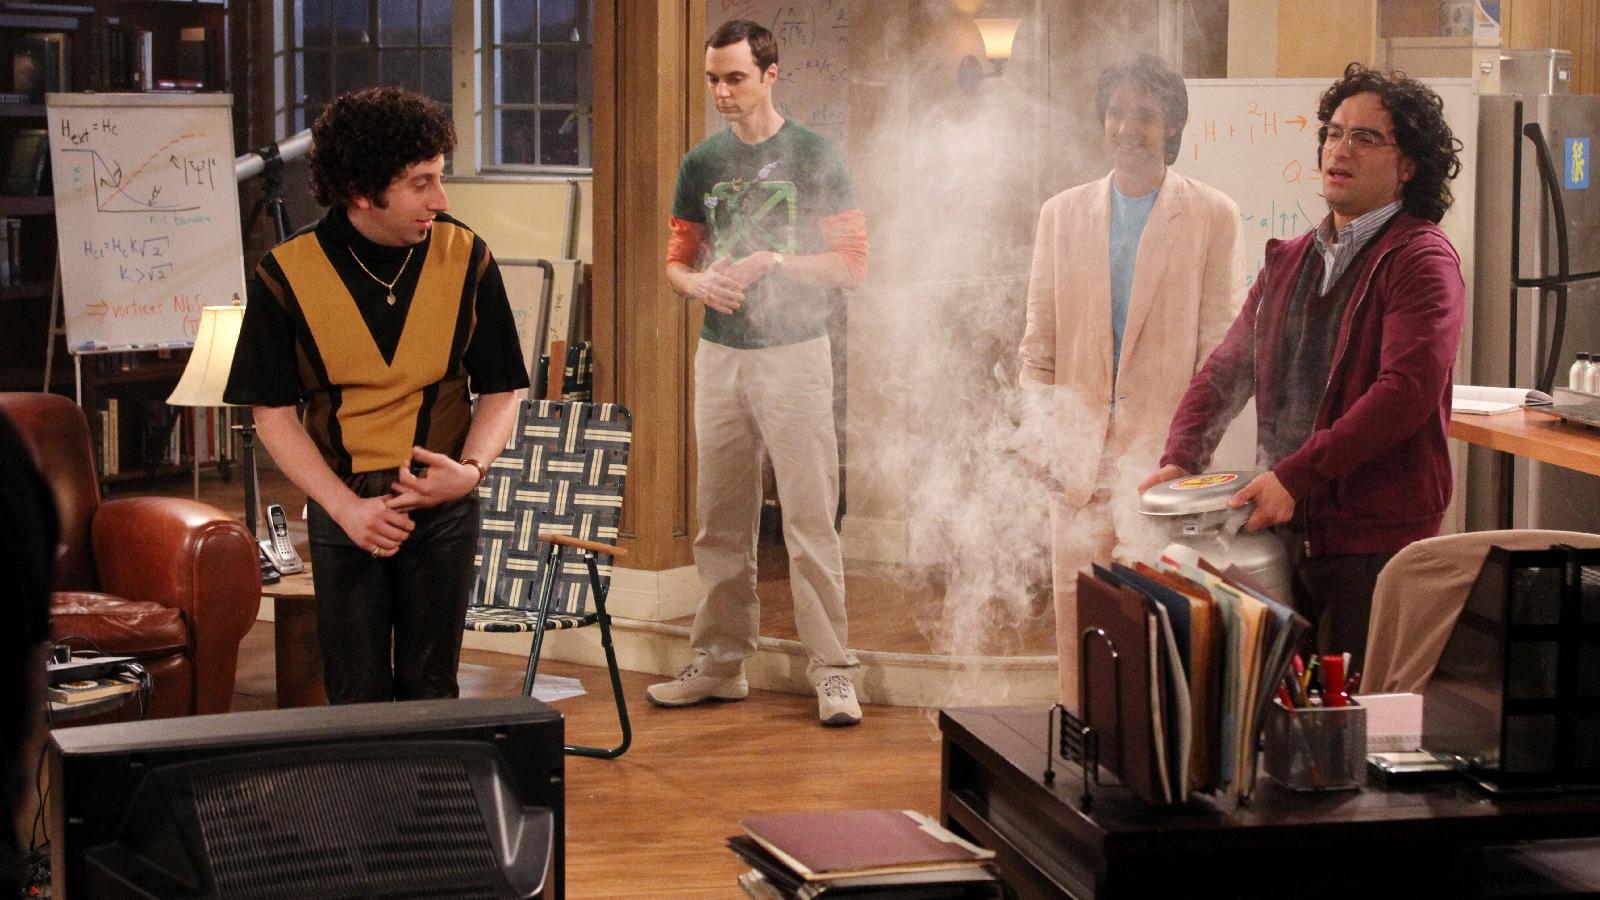 Das ist der Drehort zu The Big Bang Theory